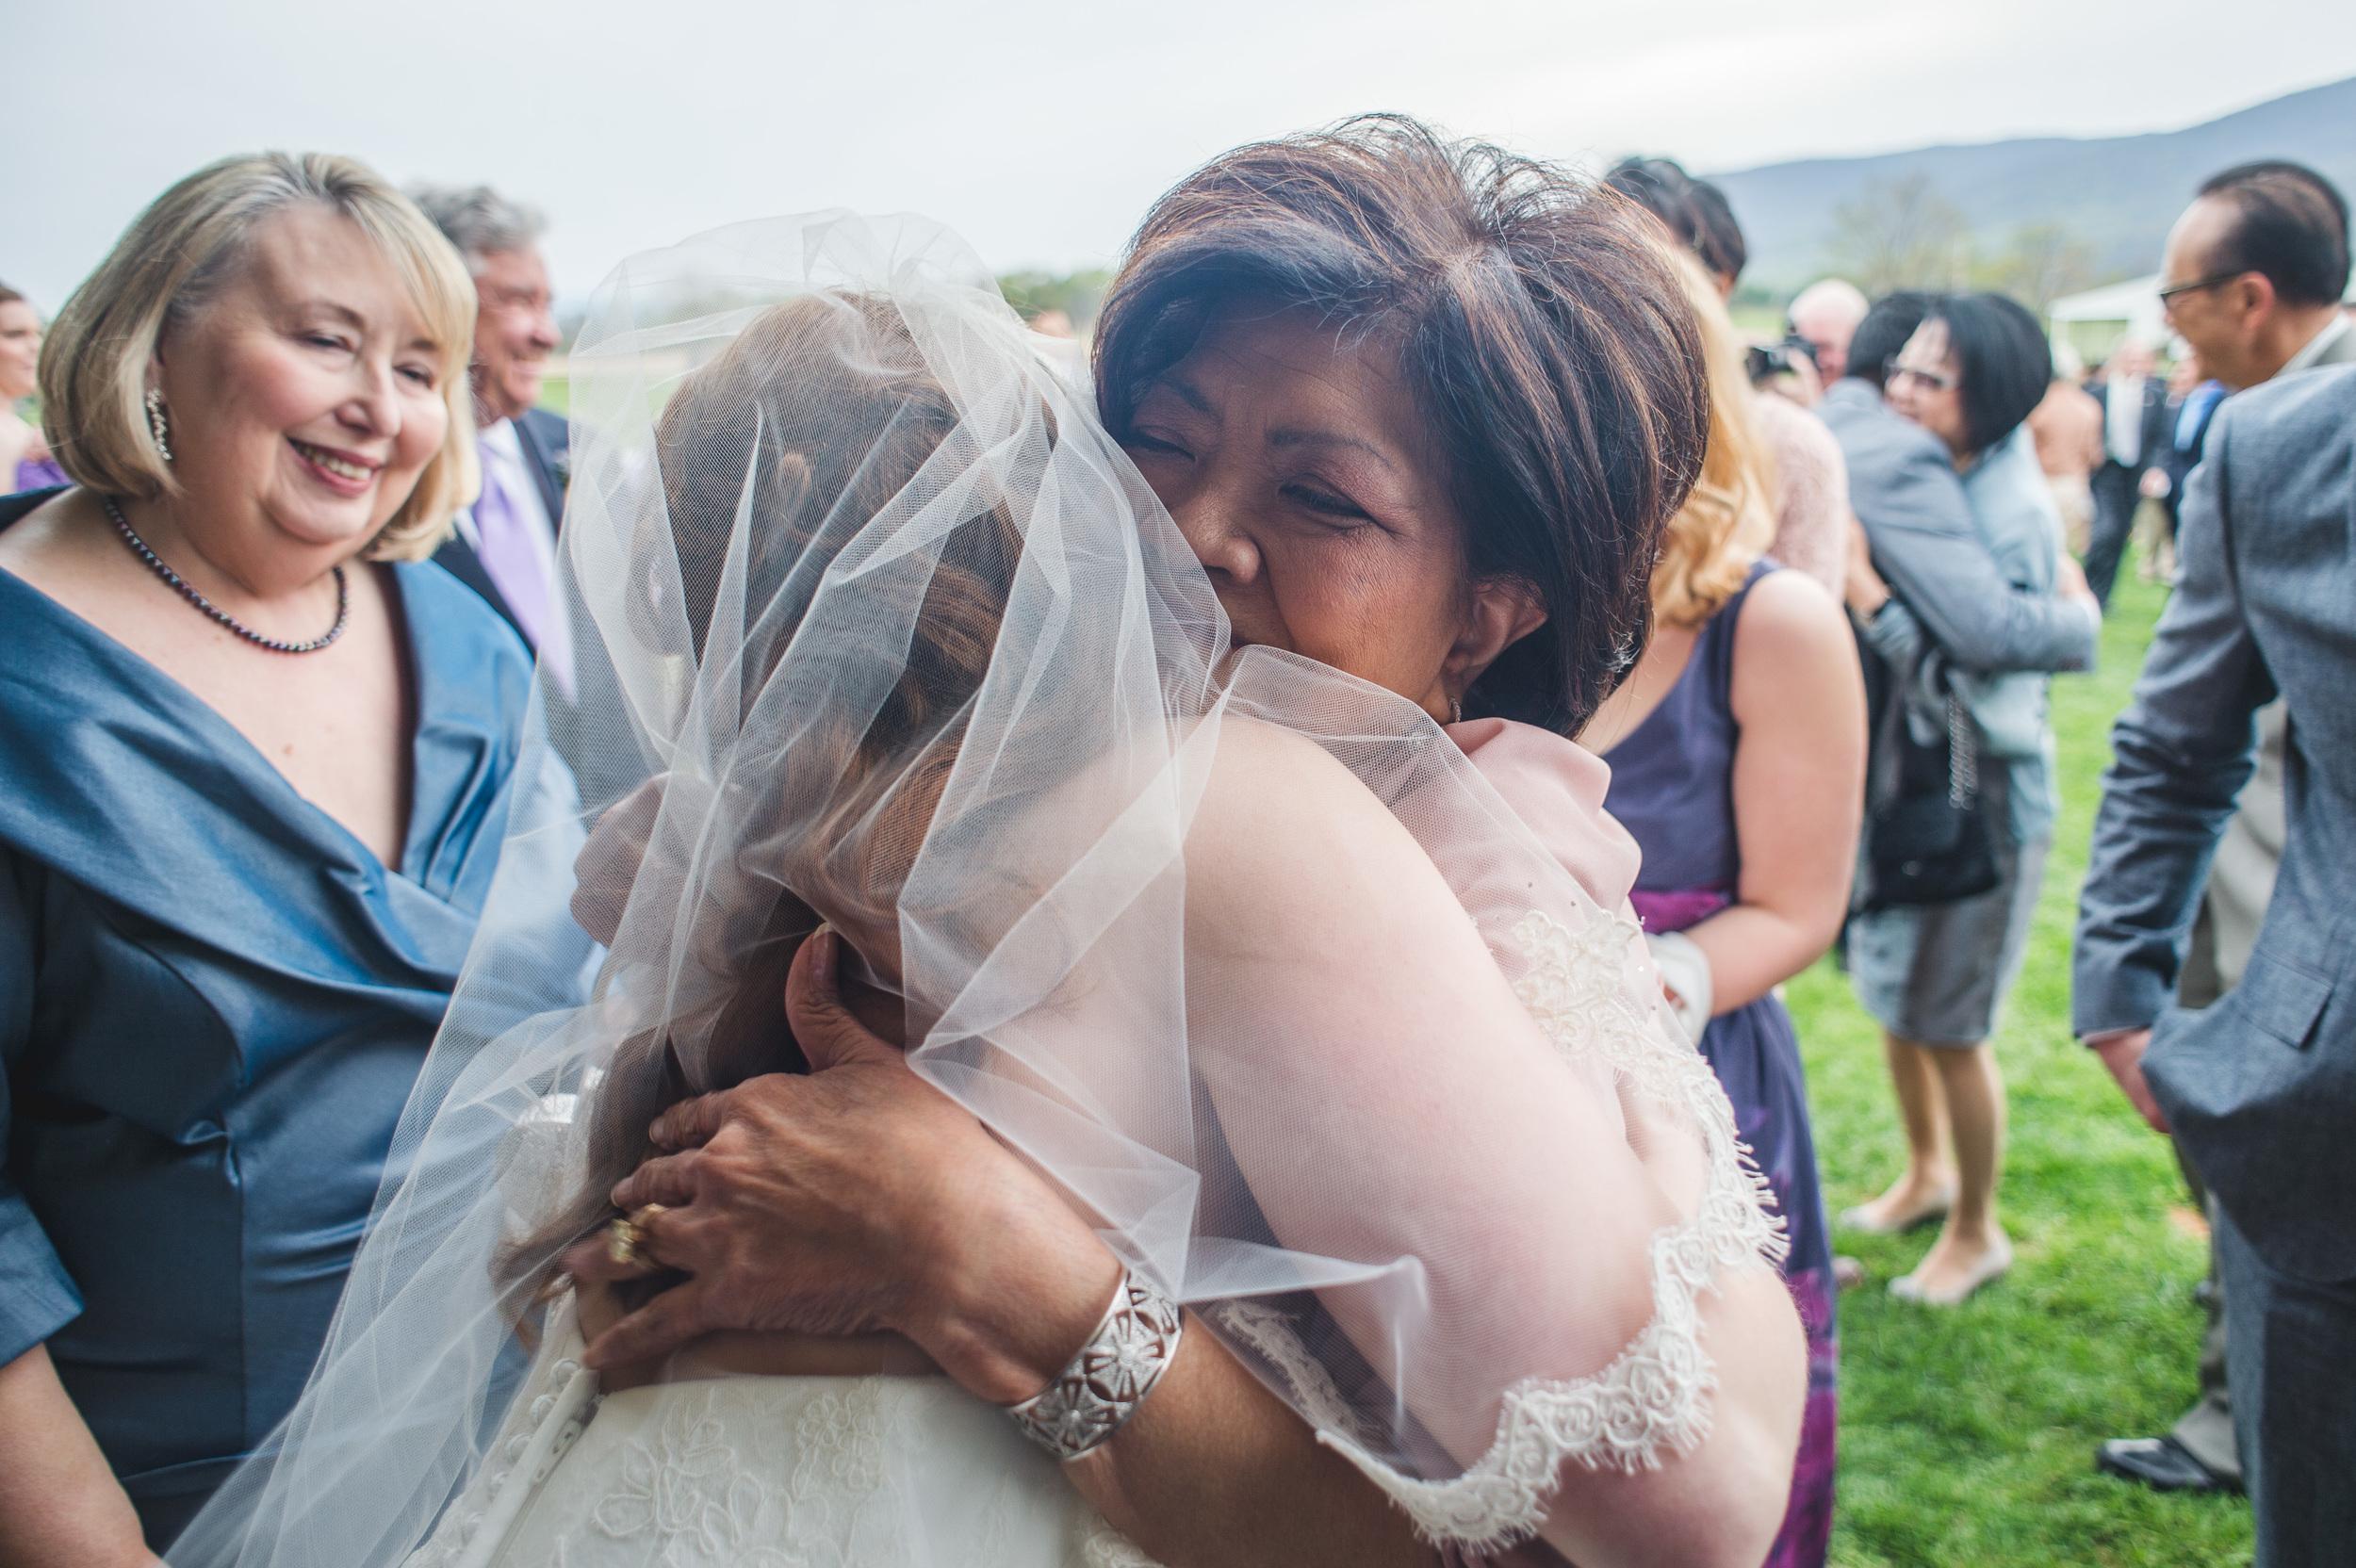 Photojournalistic wedding photography Baltimore MD By Mantas Kubilinskas-22.jpg